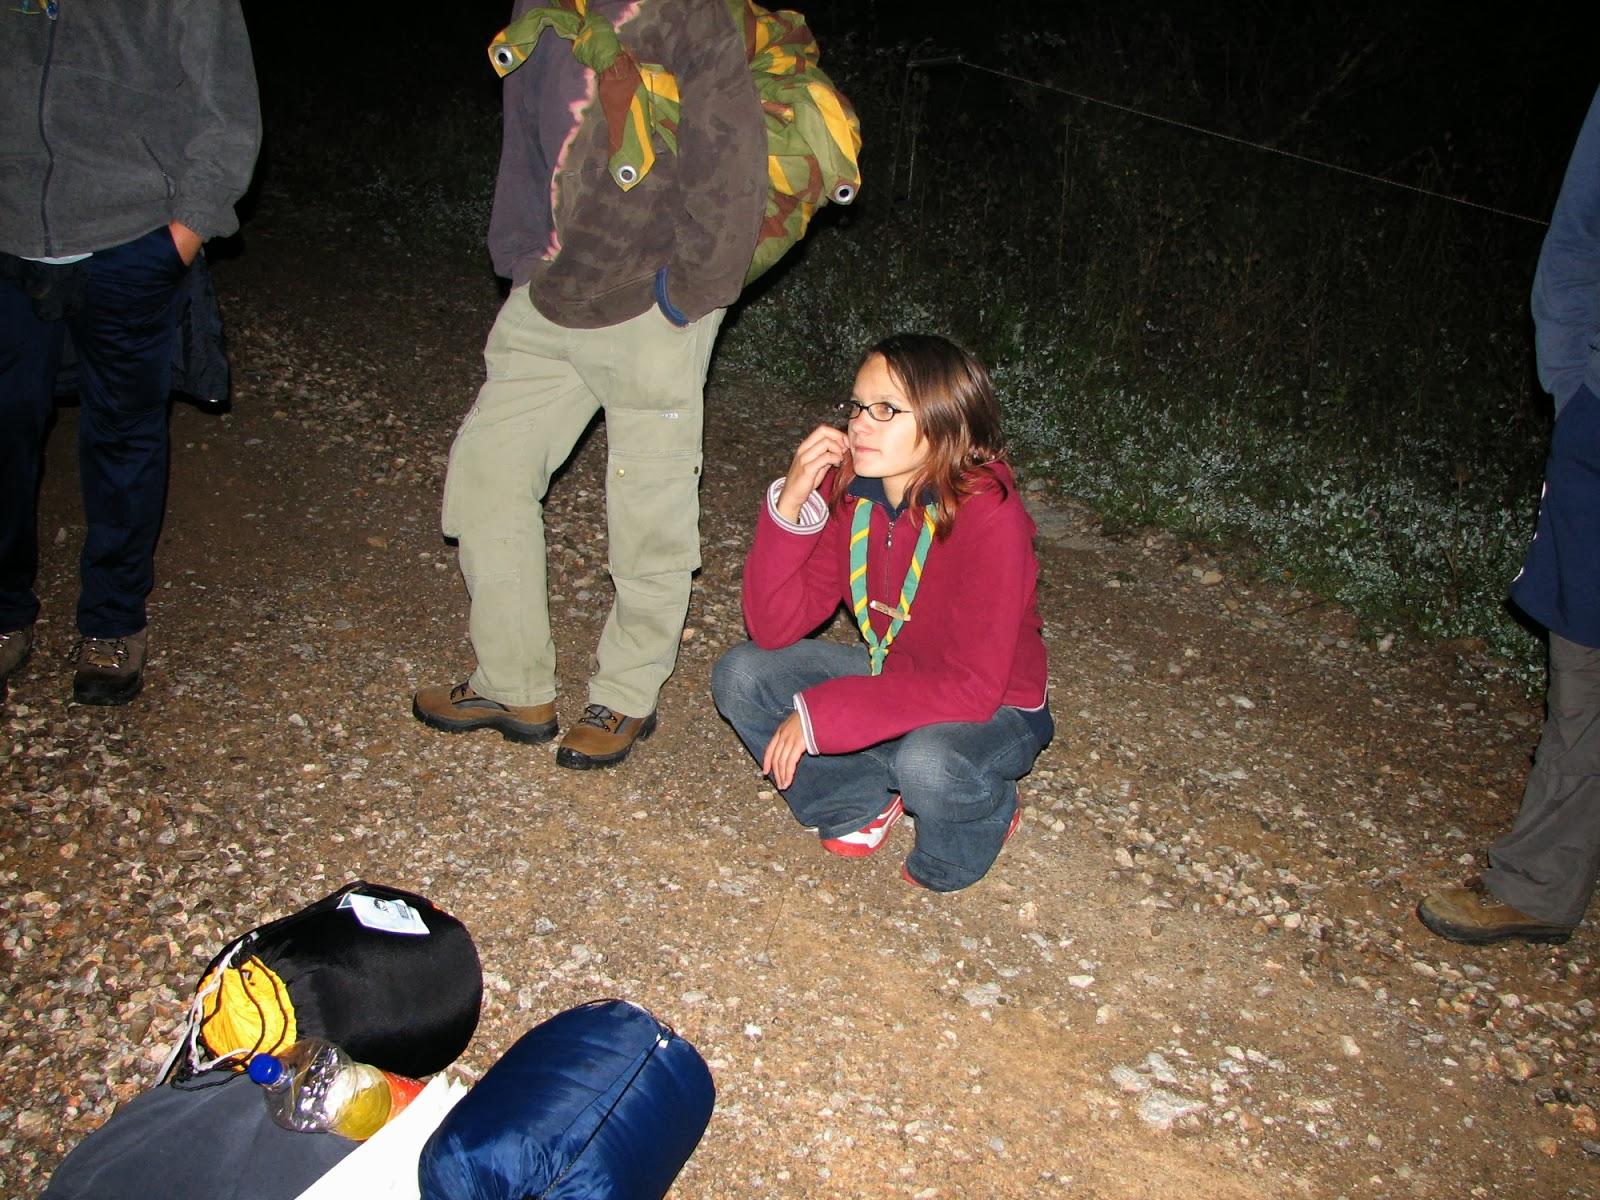 Prehod PP, Ilirska Bistrica 2005 - picture%2B028.jpg